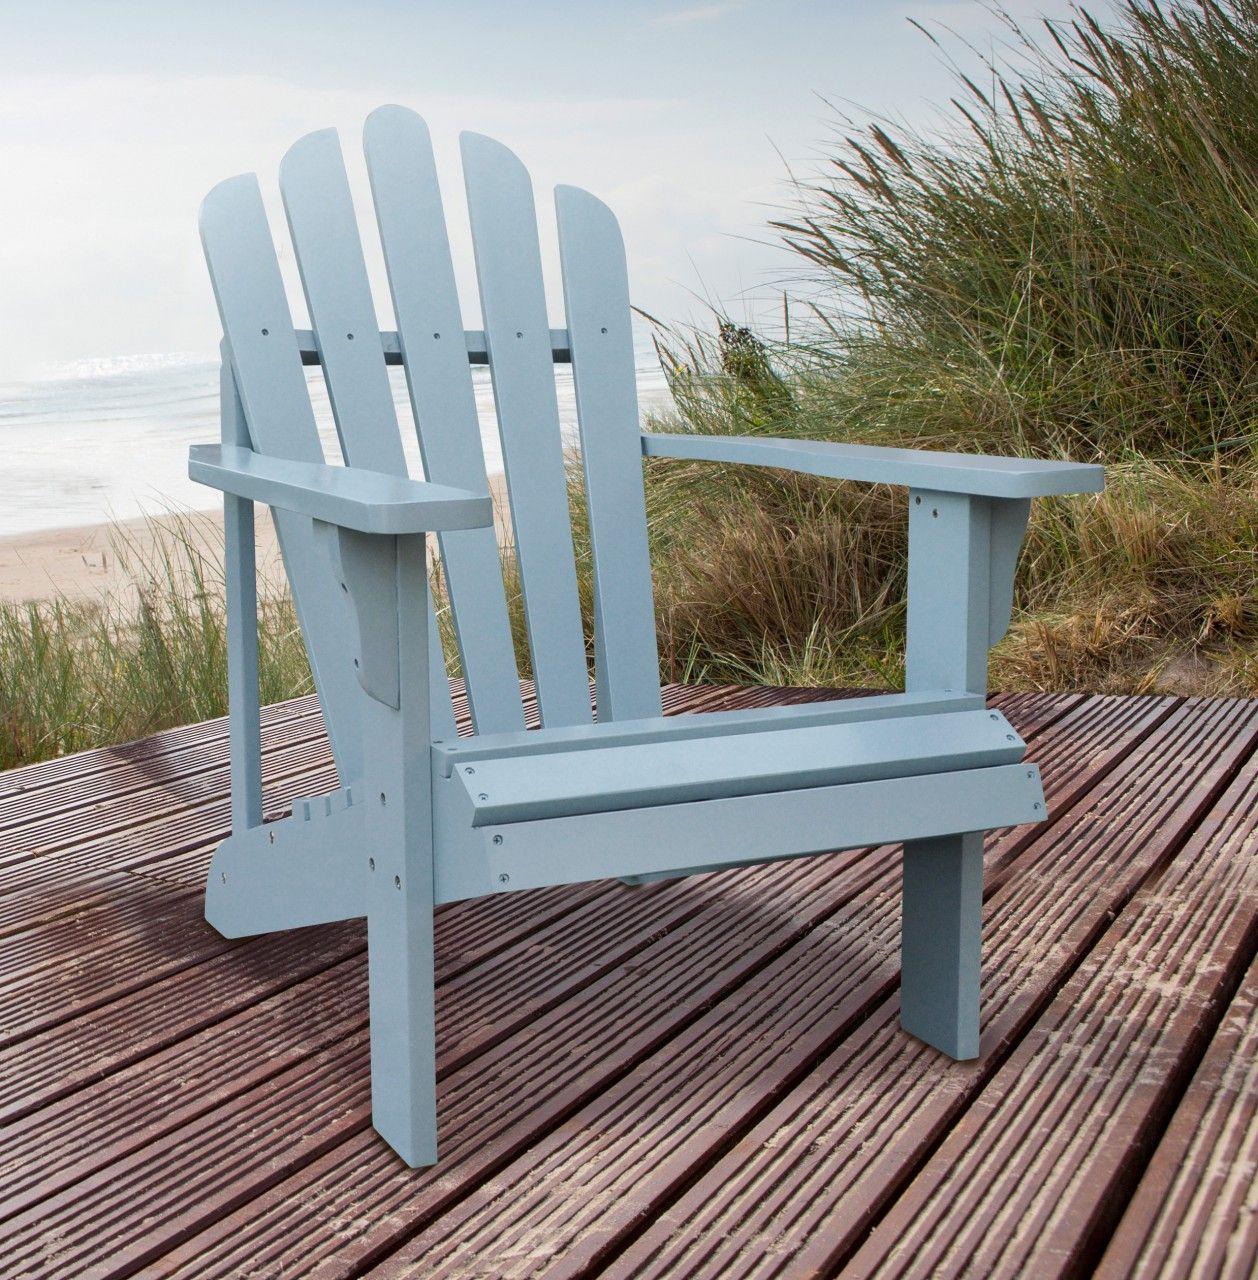 Shineco Westport Standard Adirondack Chair In Dutch Blue. Adirondack Chairs DutchBlueFurnitureProductsPatioHtml